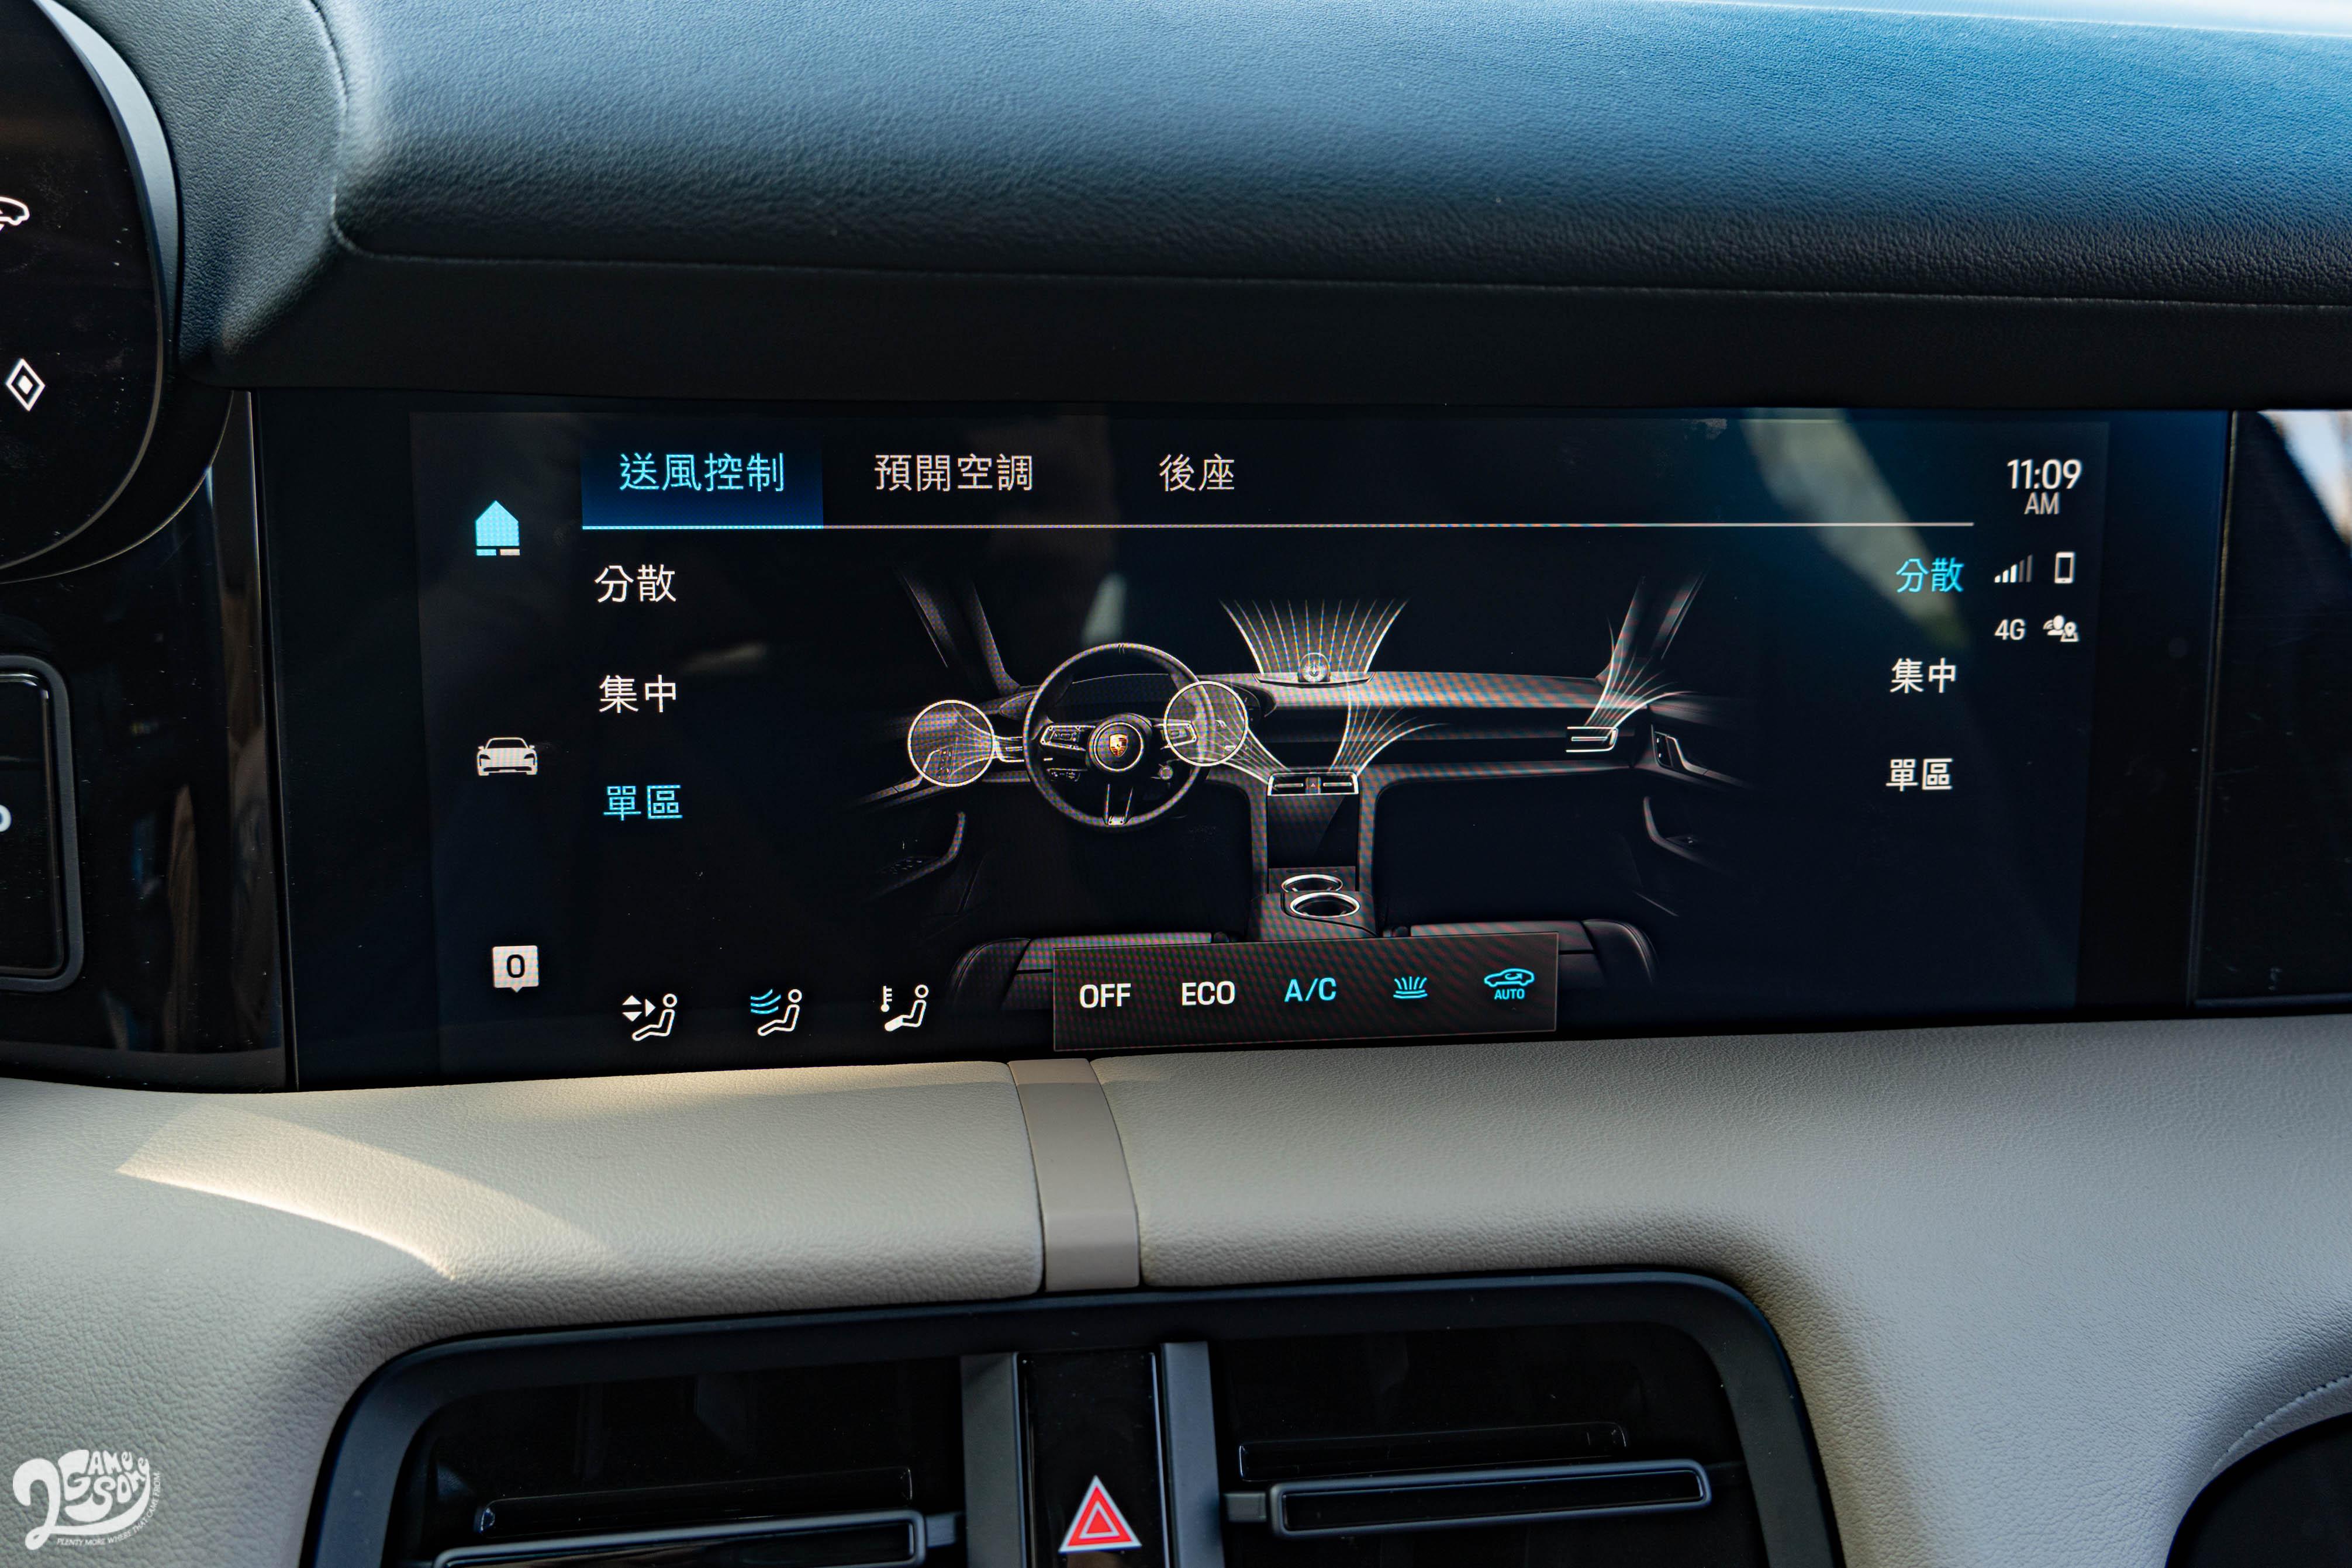 Taycan 出風口採用無橫柵設計,包含風向、風力與溫度設定等功能操作,皆可透過中控螢幕觸控調整。